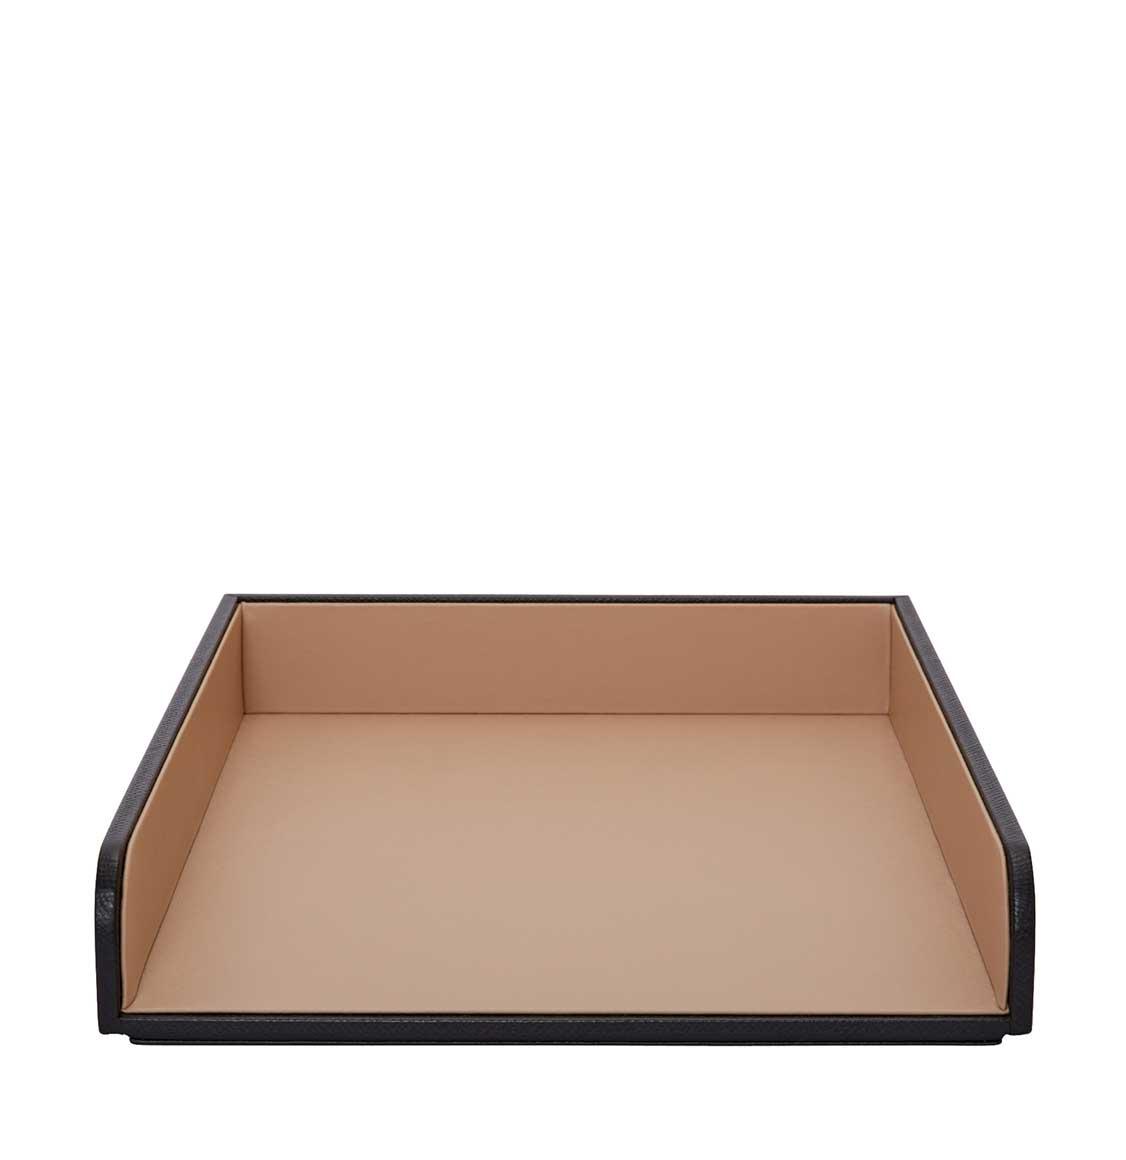 Smythson Panama Cross-Grain Leather A4 Paper Tray